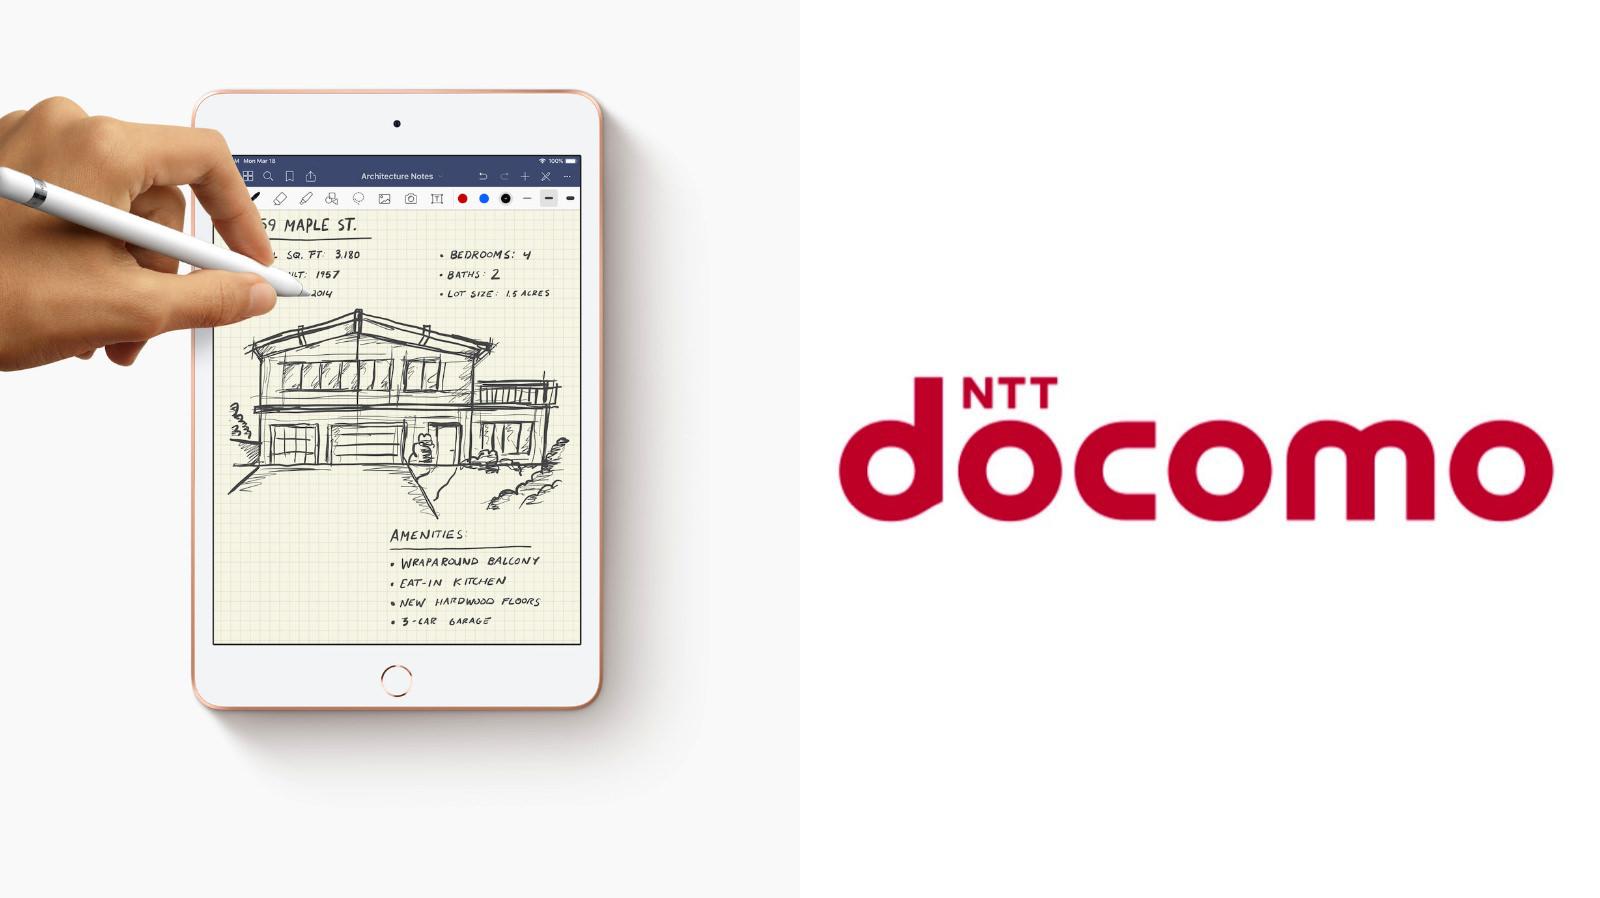 docomo-pricing-for-ipad-air-mini.jpg